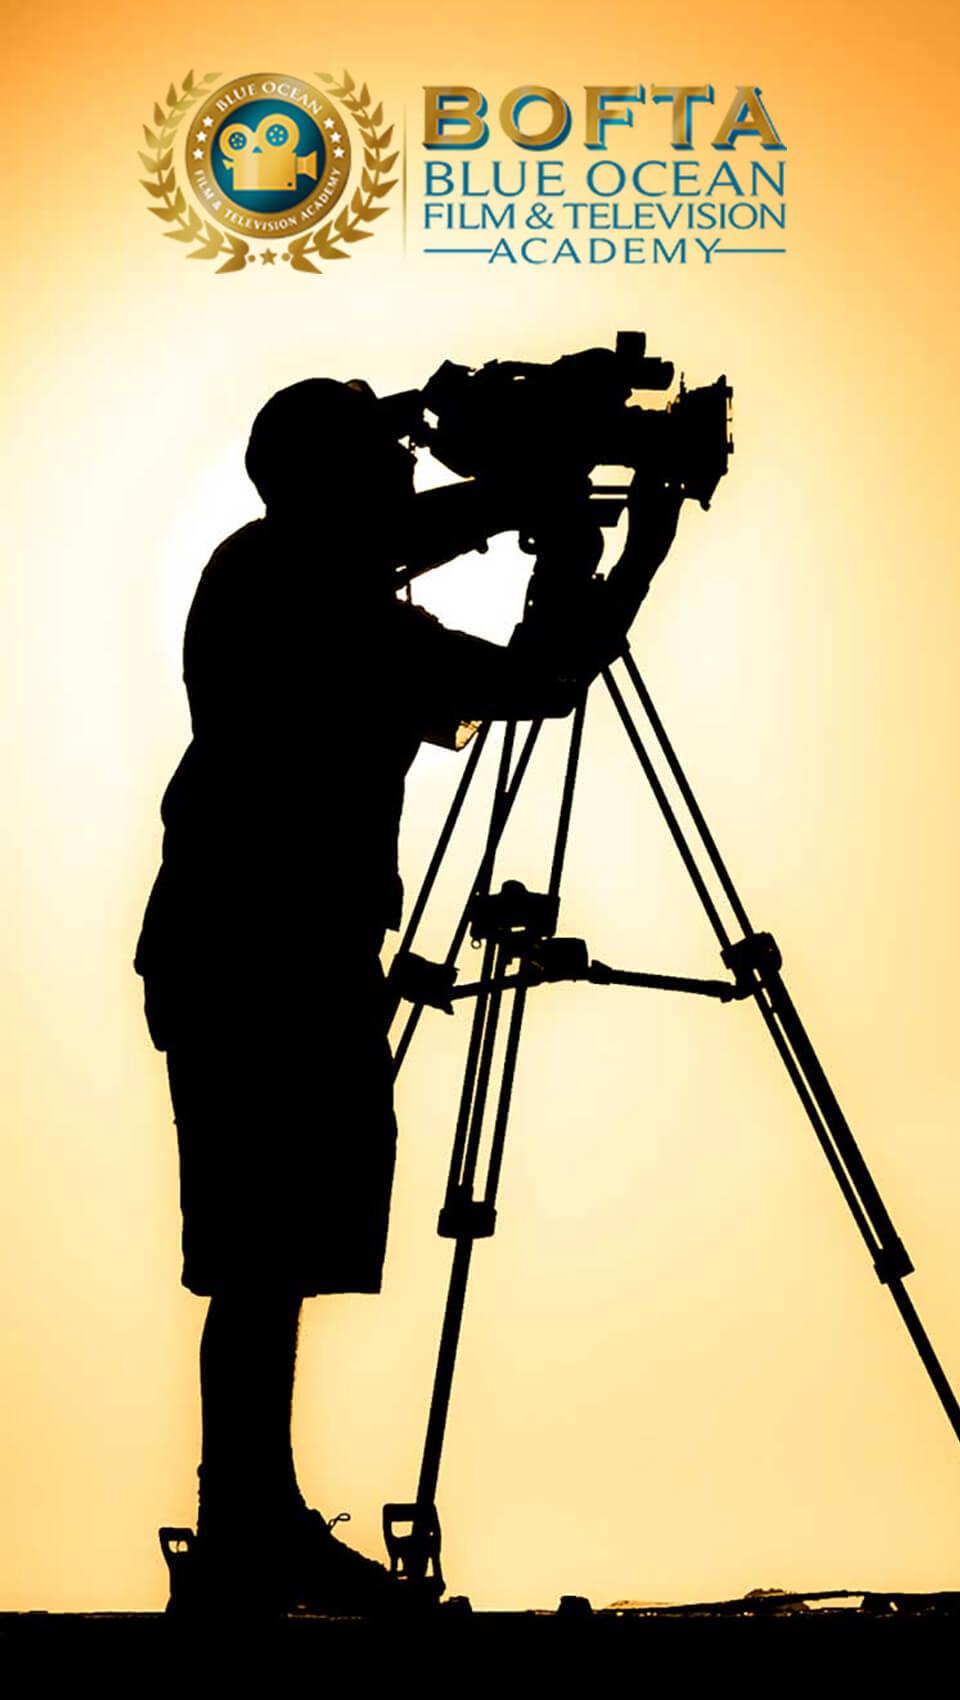 BOFTA - Learn from the Masters - cms - buzztm - BOFTA, Blue Ocean Film & Television Academy